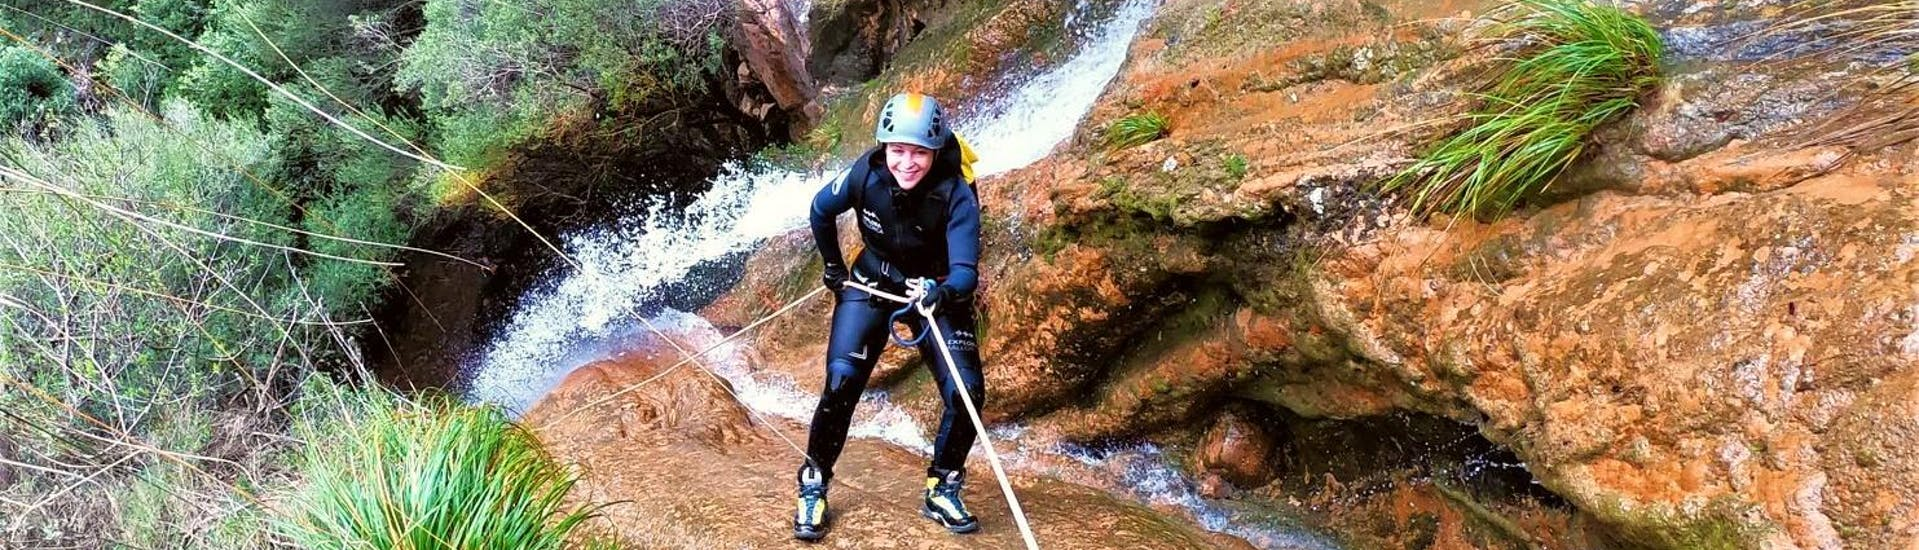 Advanced Canyoning in Mallorca with Explora Mallorca - Hero image